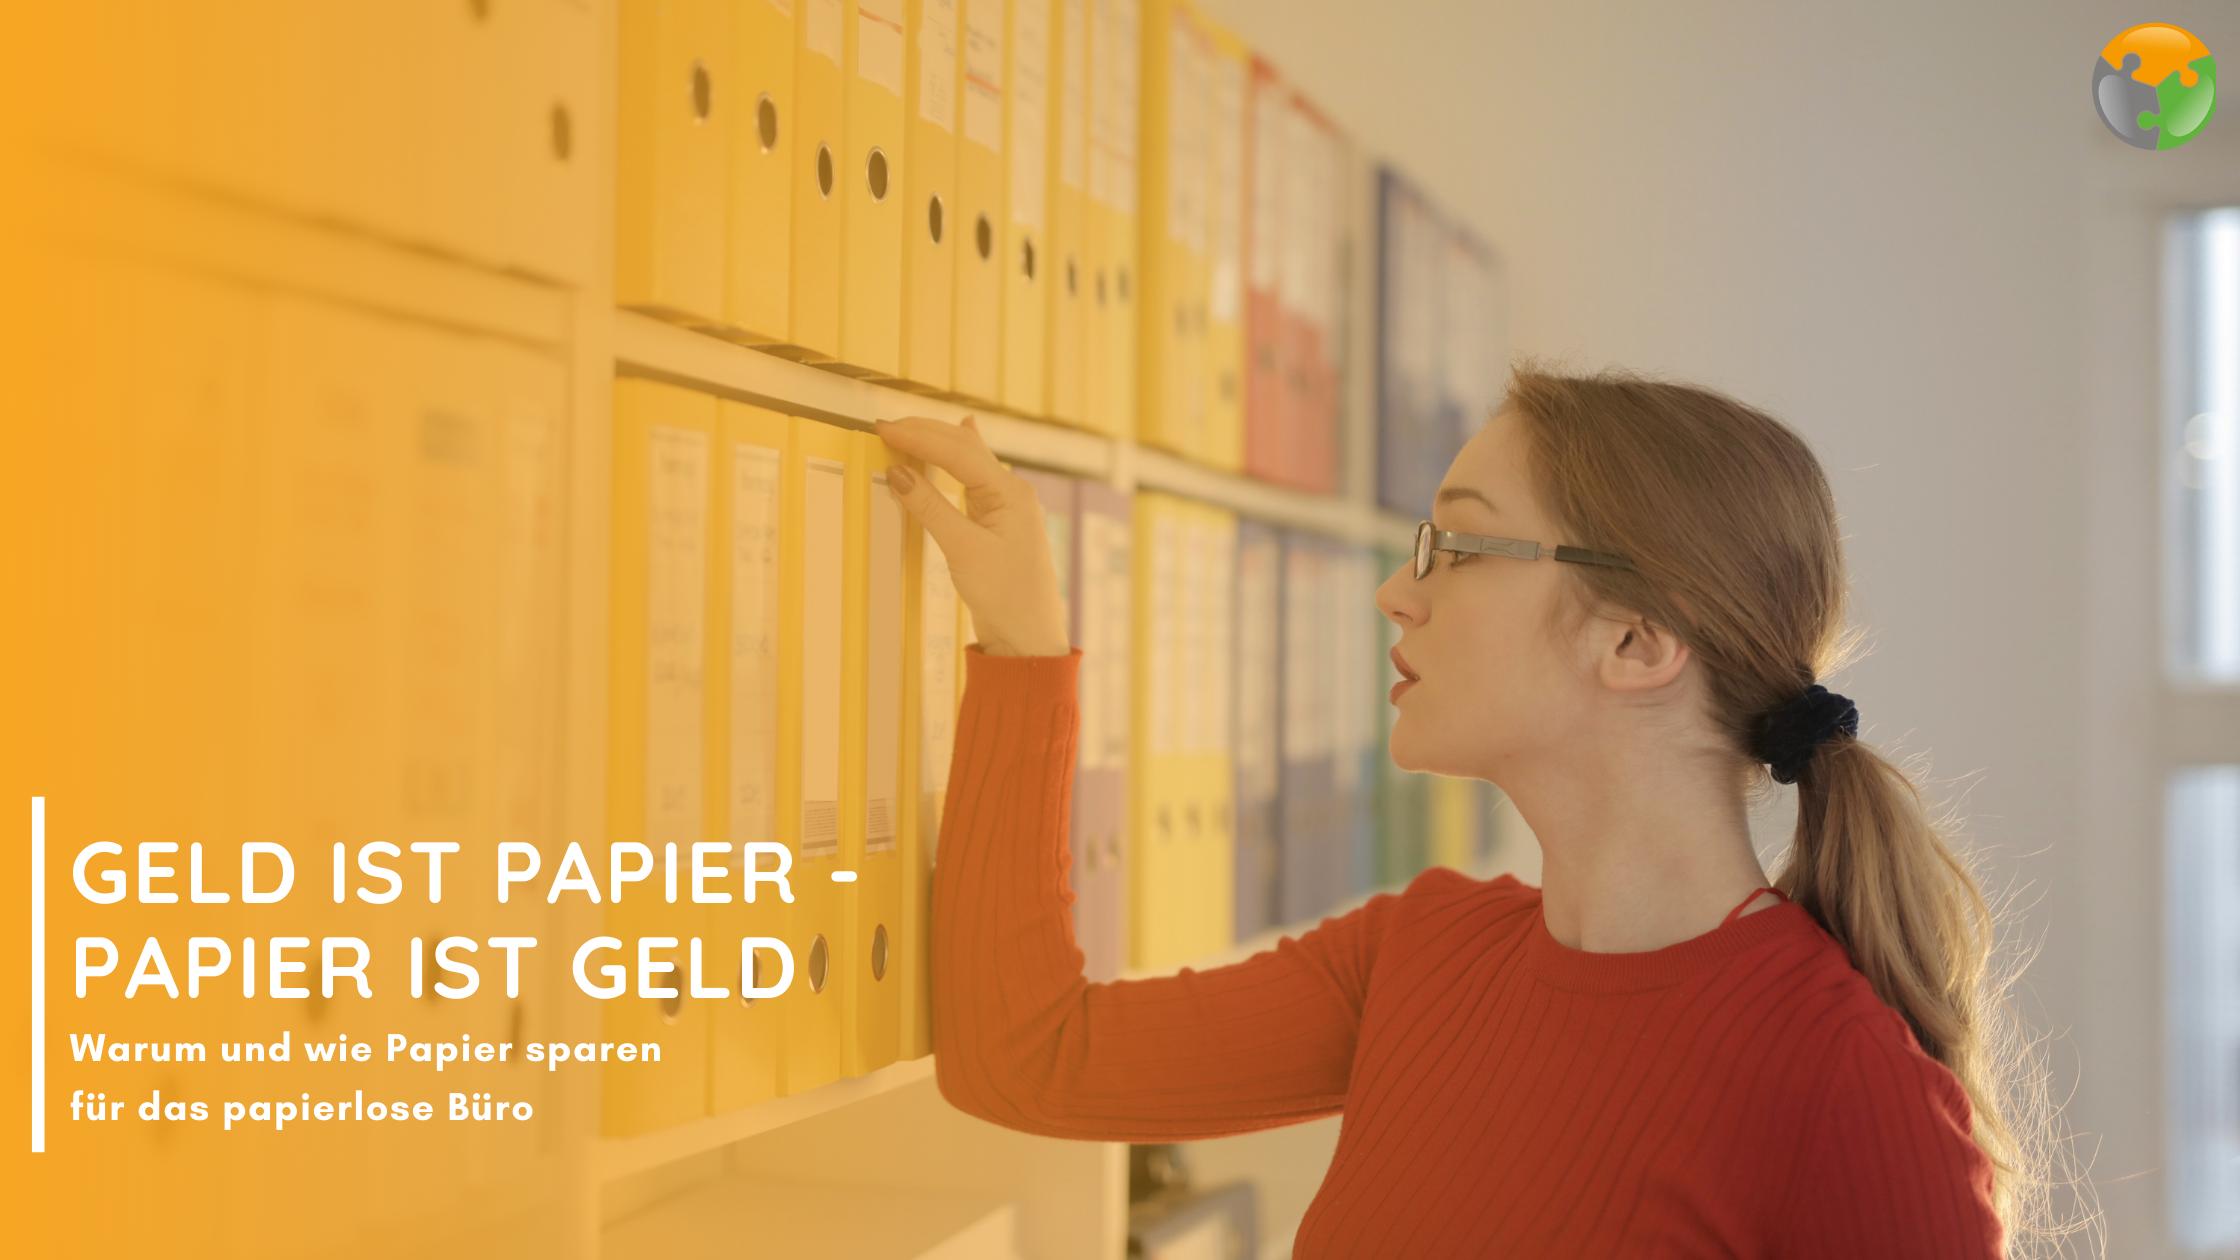 Papierloses Büro Dokumentenmanagementysystem Workflows